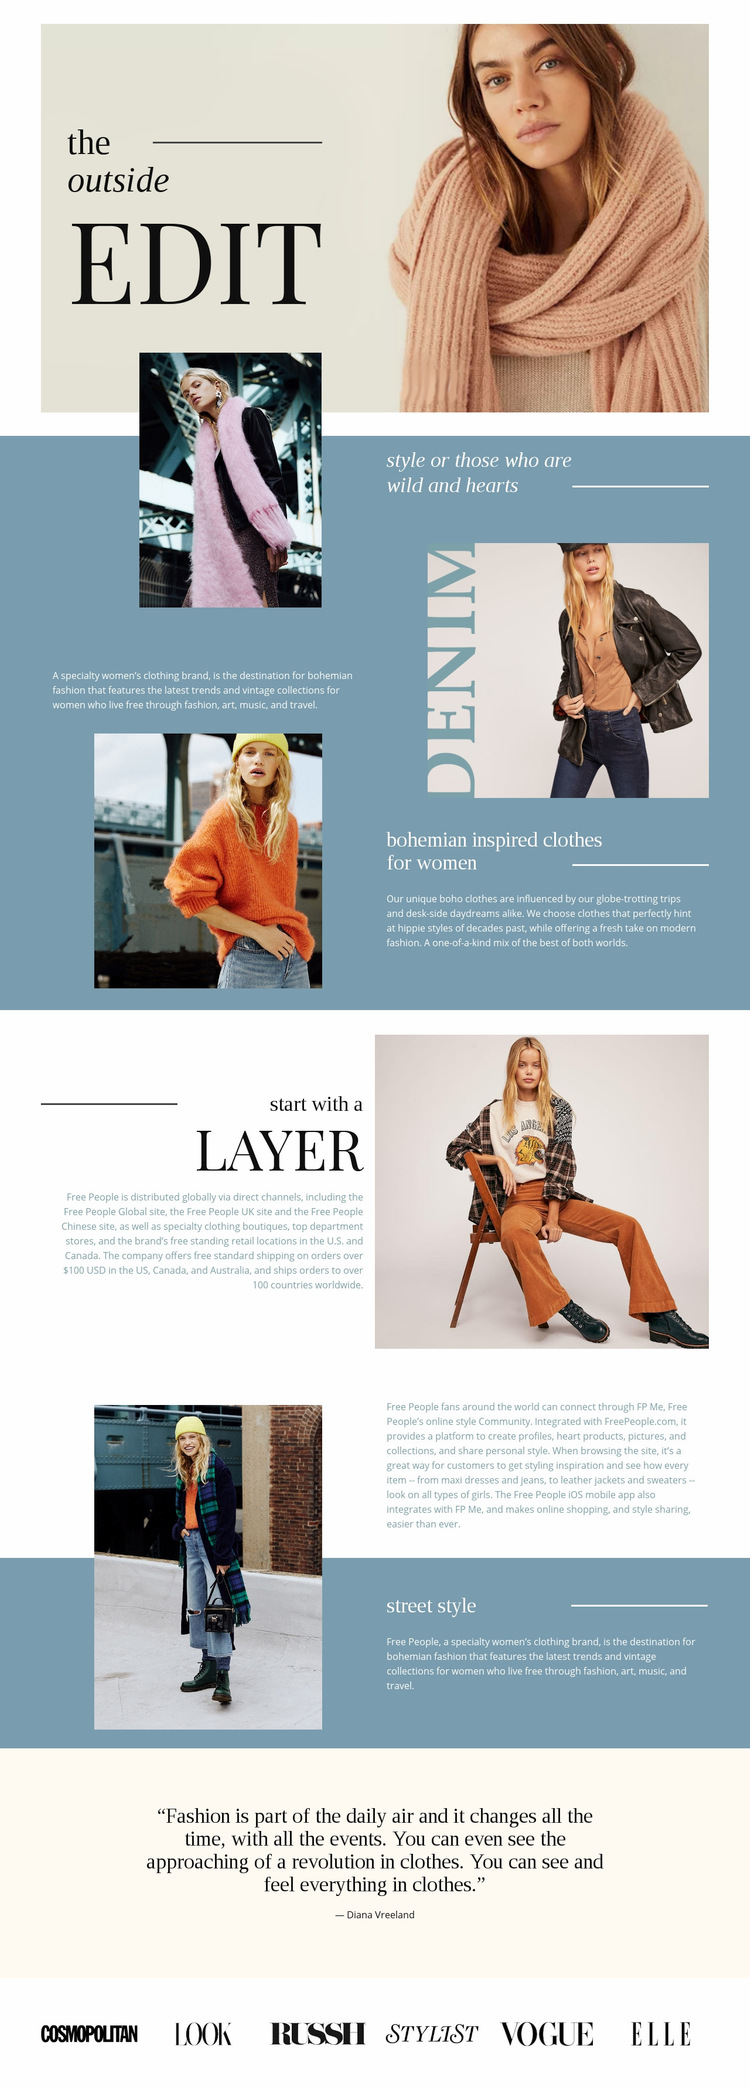 Ideas for autumn looks Web Page Design